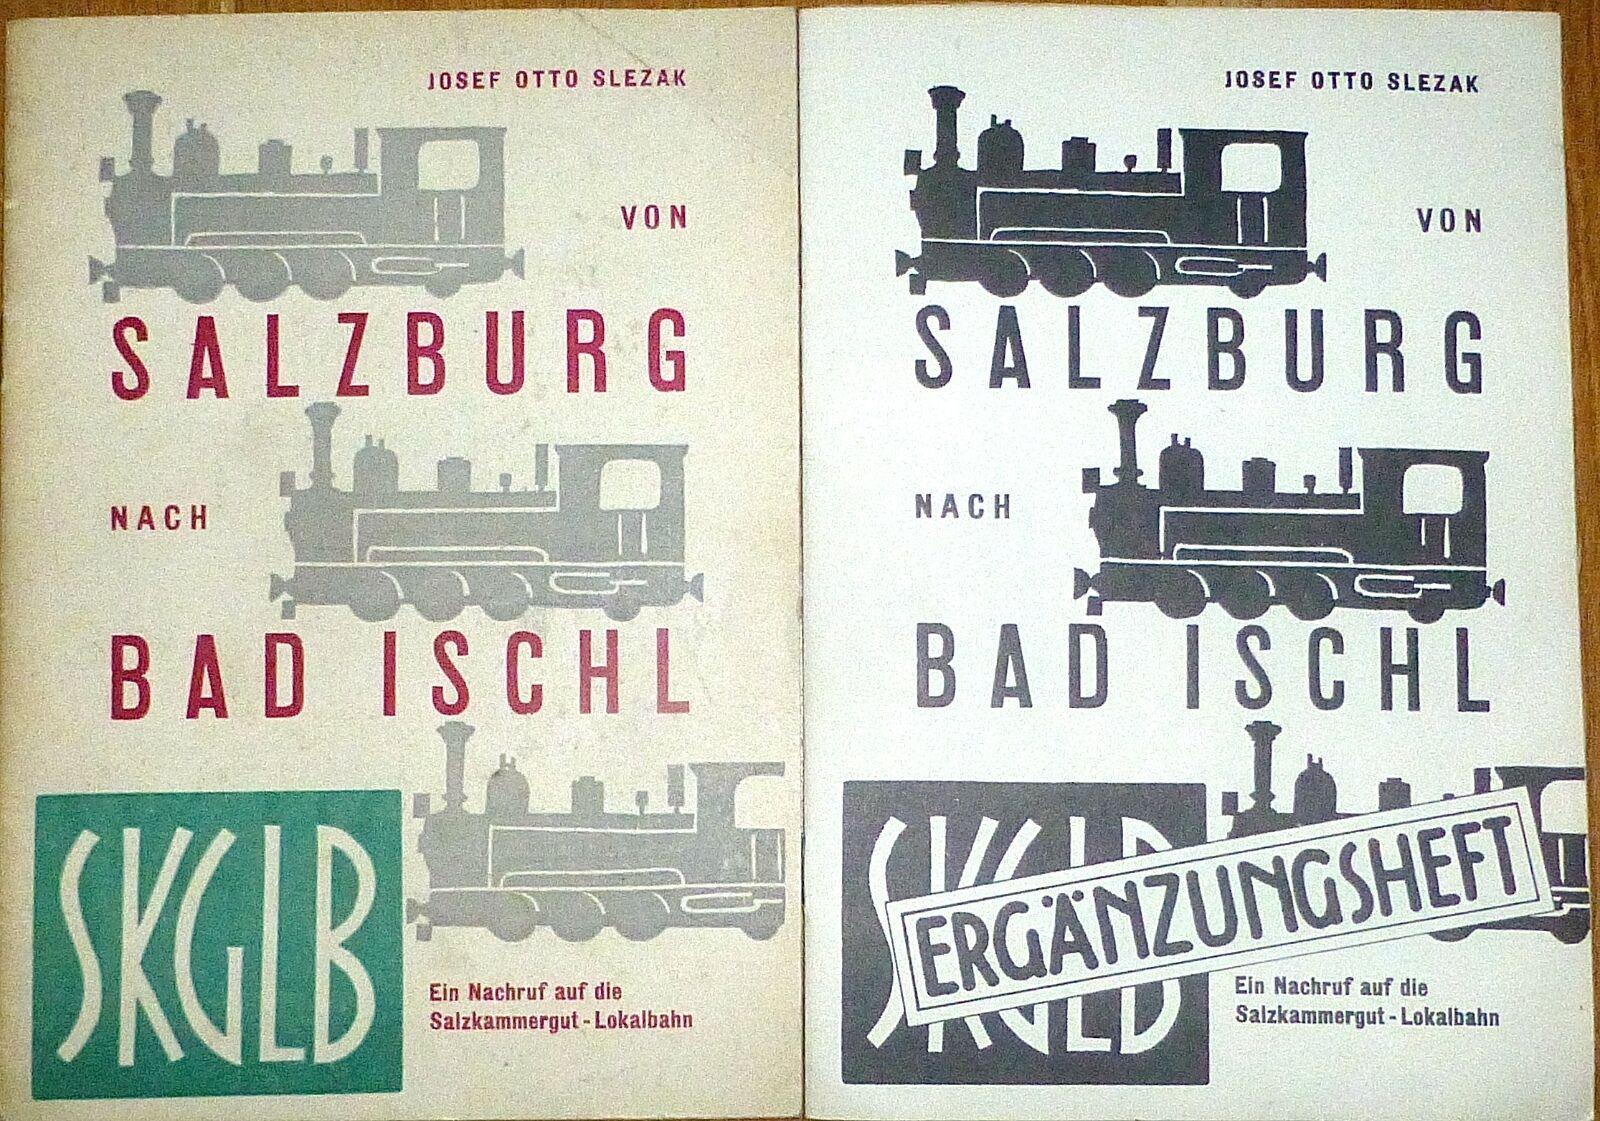 Von Salzburg dopo Borsano Ischl Skglb + Supplemento Josef Otto Slezak Vienna 1958